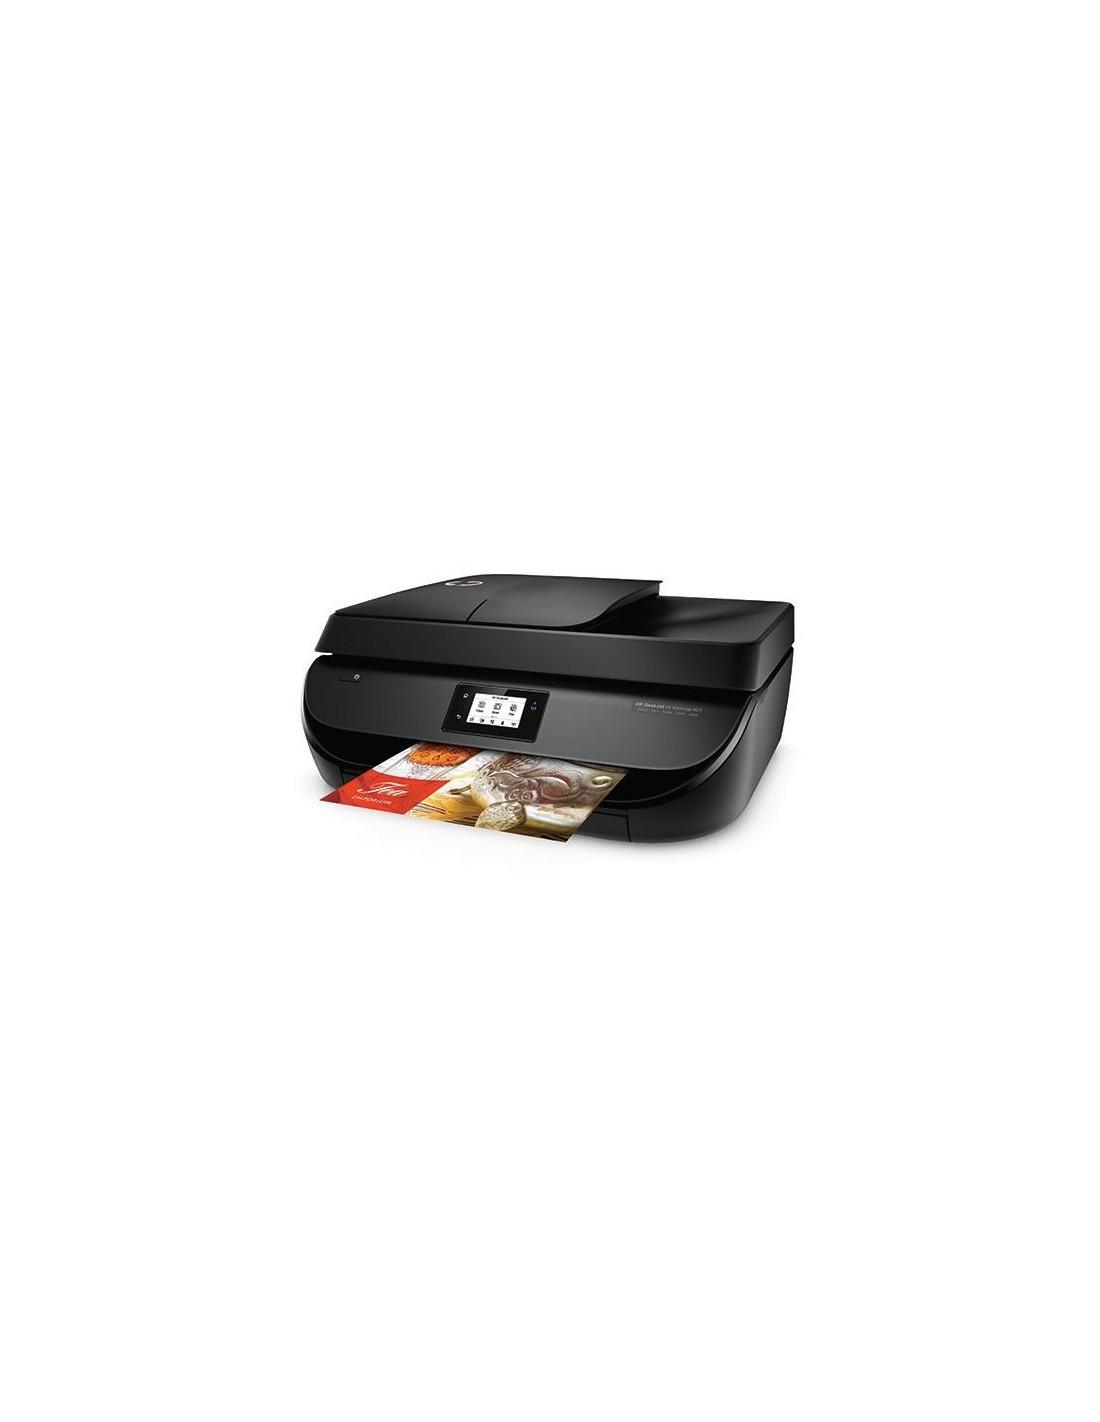 Imprimante Tout En Un Hp Deskjet Ink Advantage 4675 F1h97c Printer All In One